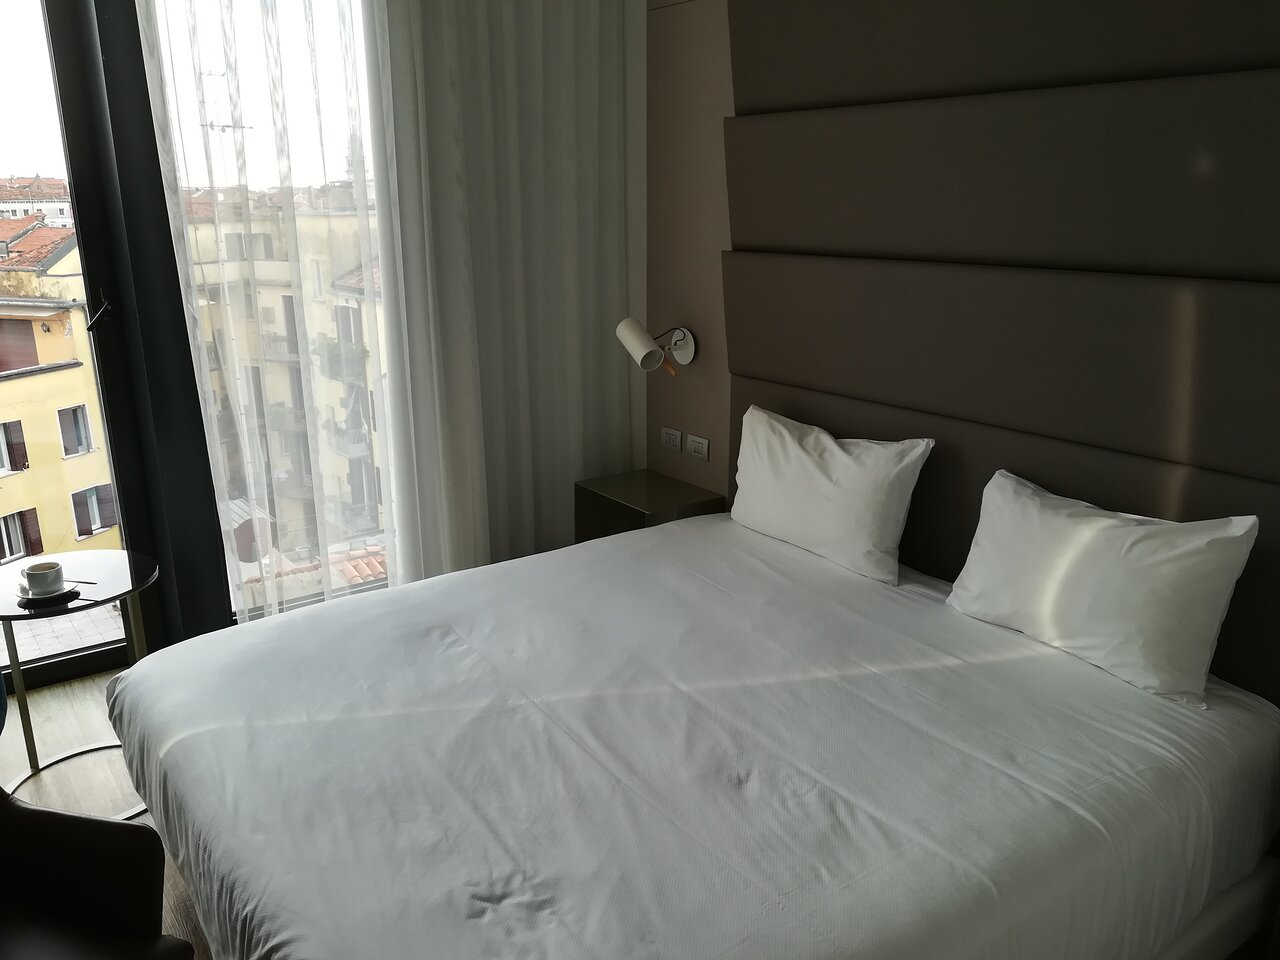 Nh Venezia Rio Novo 130 1 7 6 Updated 2021 Prices Hotel Reviews Venice Italy Tripadvisor